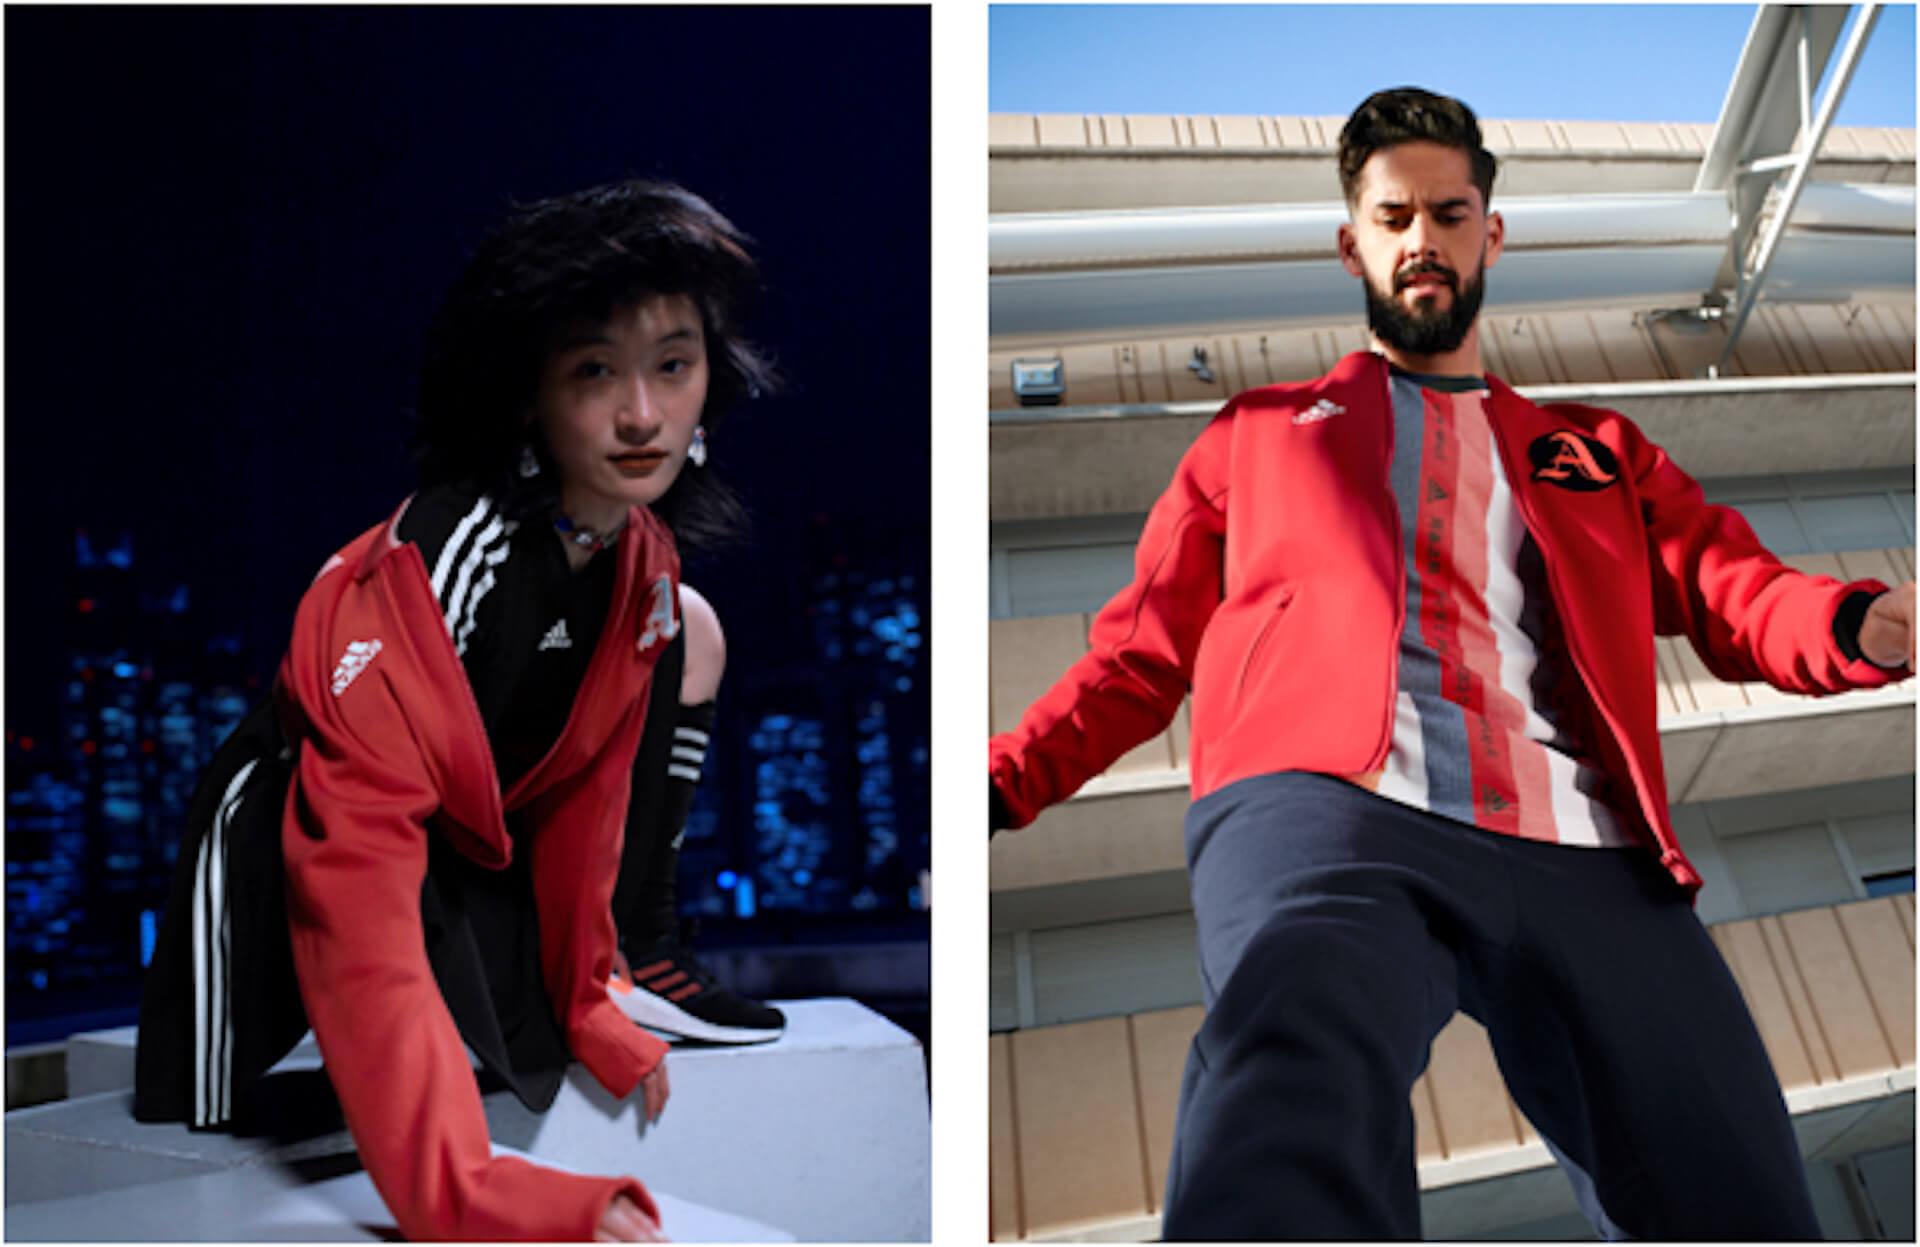 「adidas Athletics」SS20コレクションが発売!キャンペーンビジュアルを務めるコムアイのイメージフィルム本日公開 lf200206_addidasathletics_04